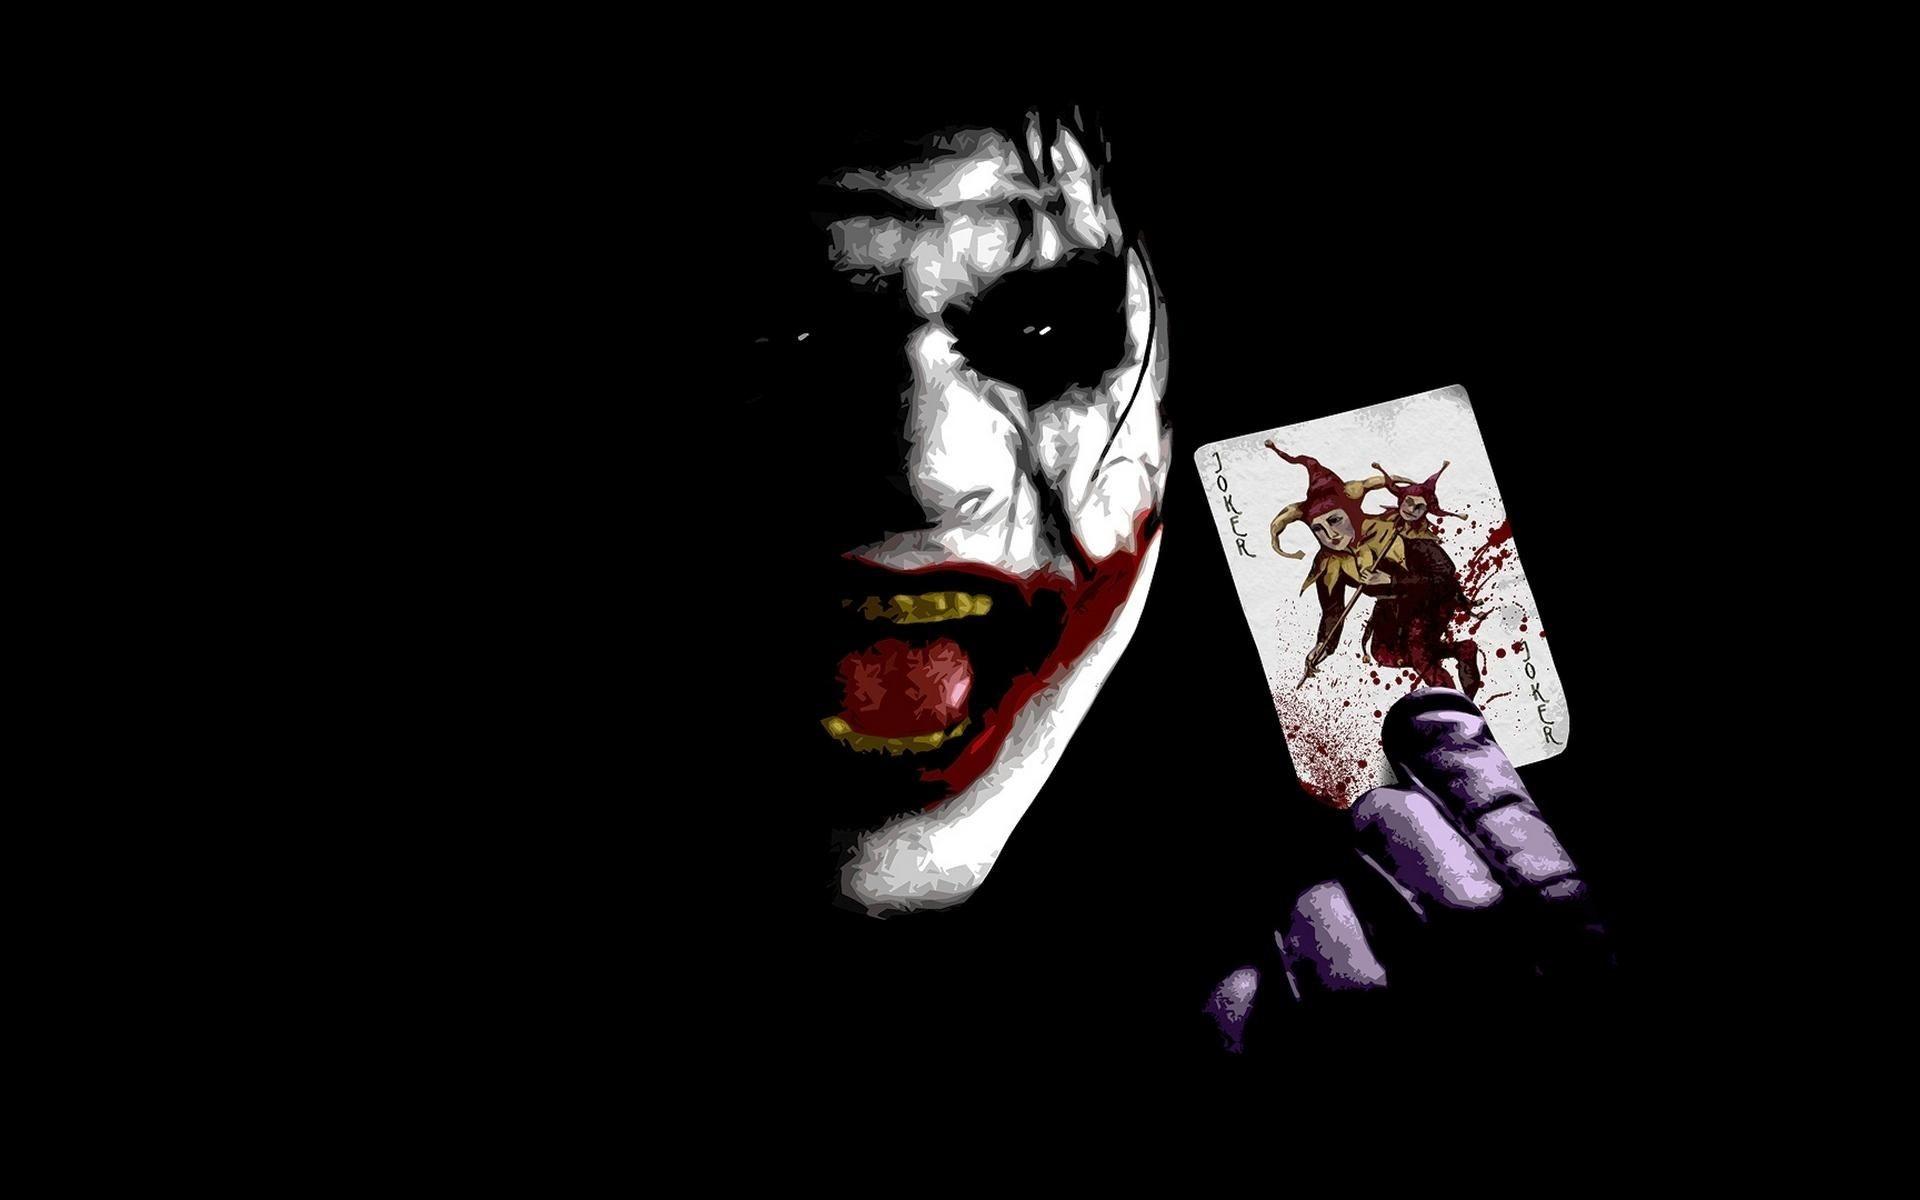 Res: 1920x1200, Scary Clown Wallpaper Desktop Background for Desktop  px 105.24 KB